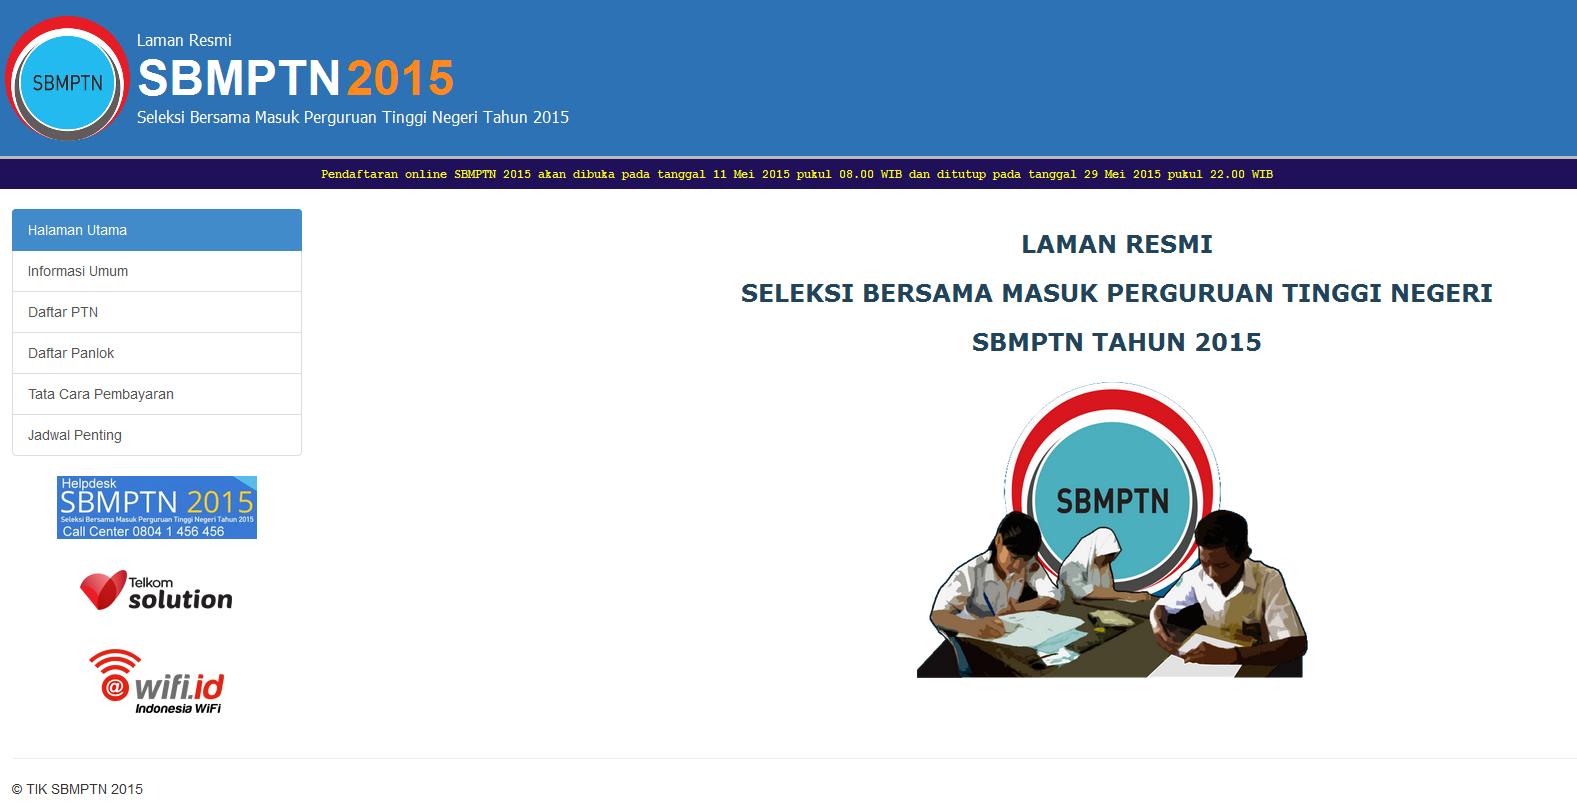 Pendaftaran SBMPTN 2015